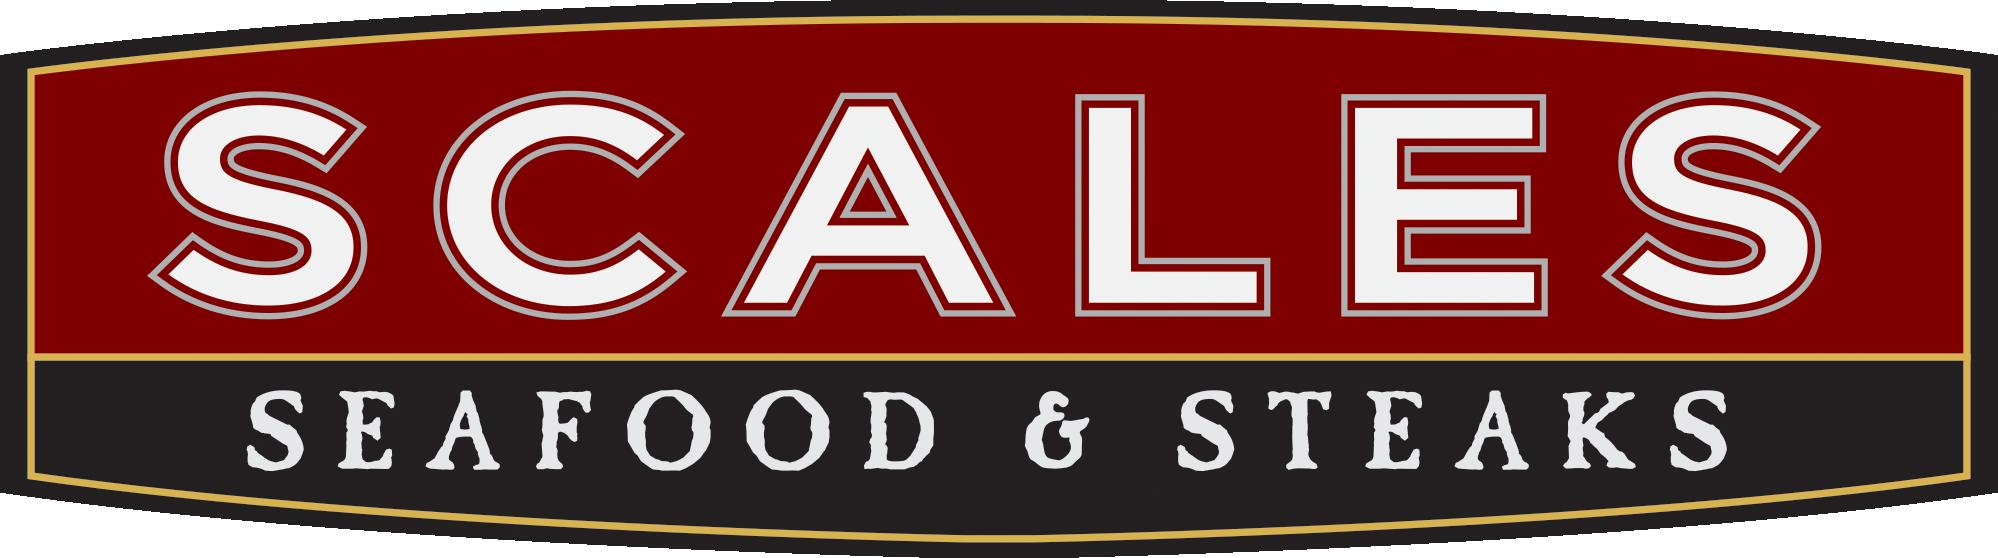 Scales Seafood & Steaks Monterey CA